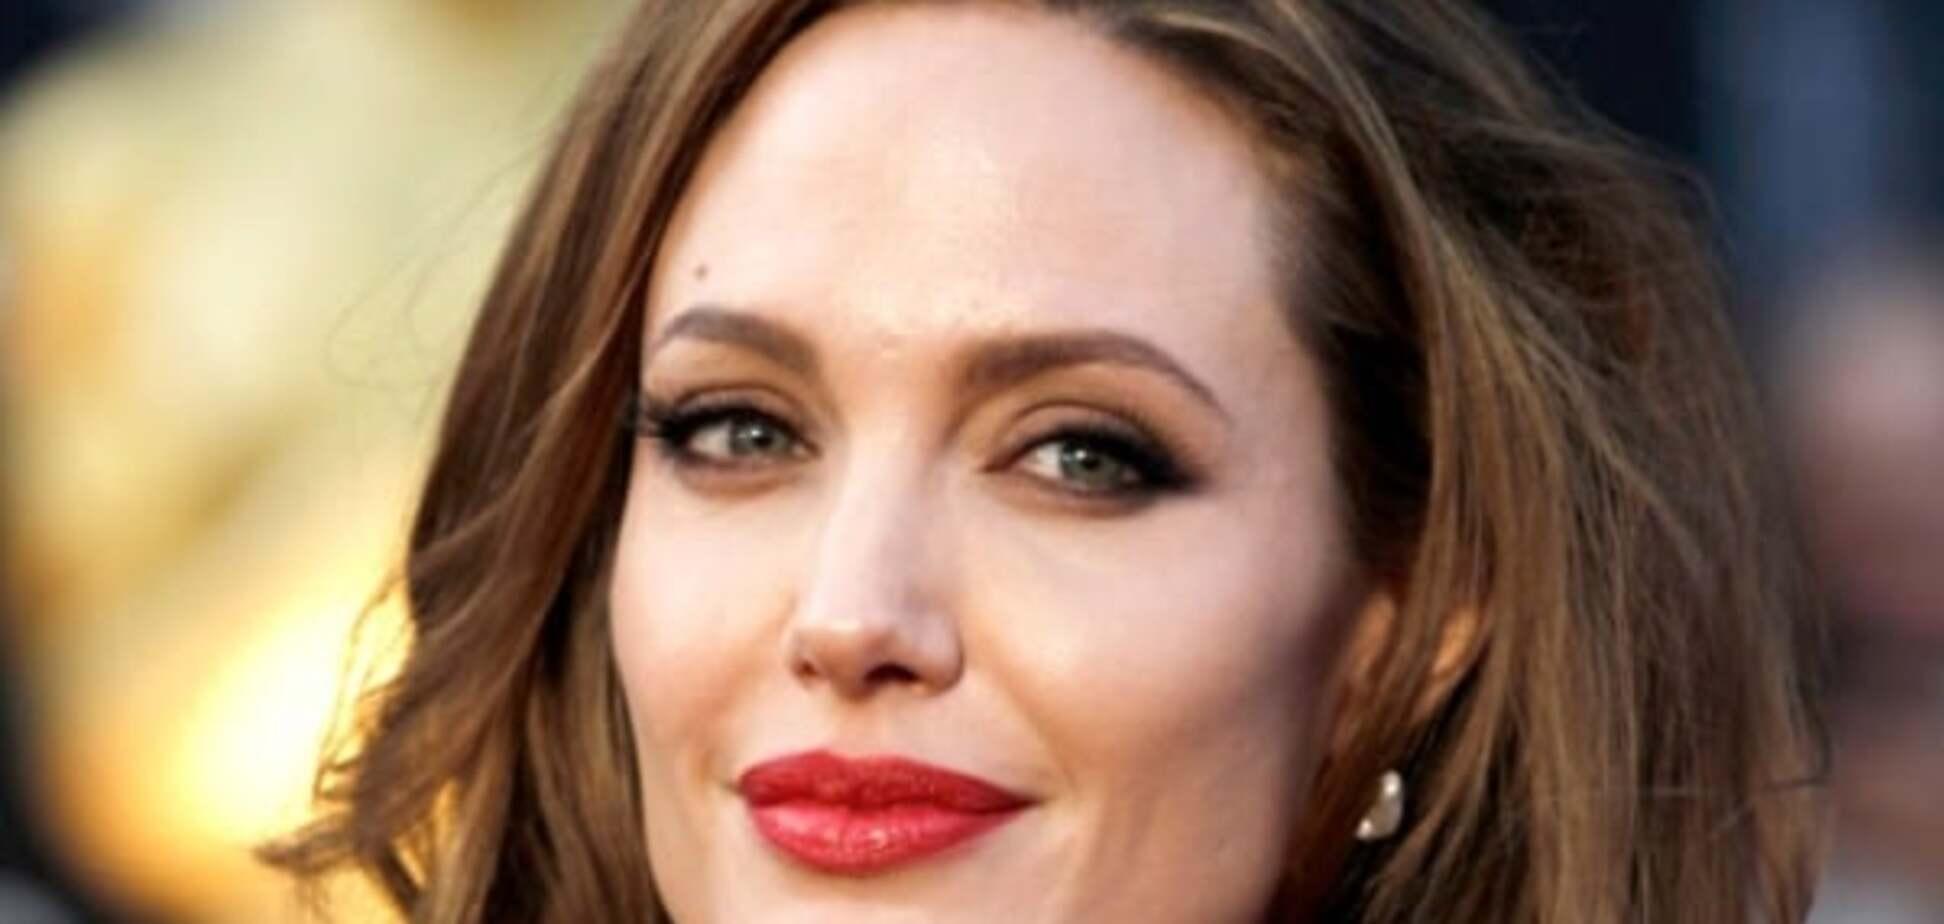 Пополнение в семье: Джоли втайне от мужа усыновила 7-го ребенка